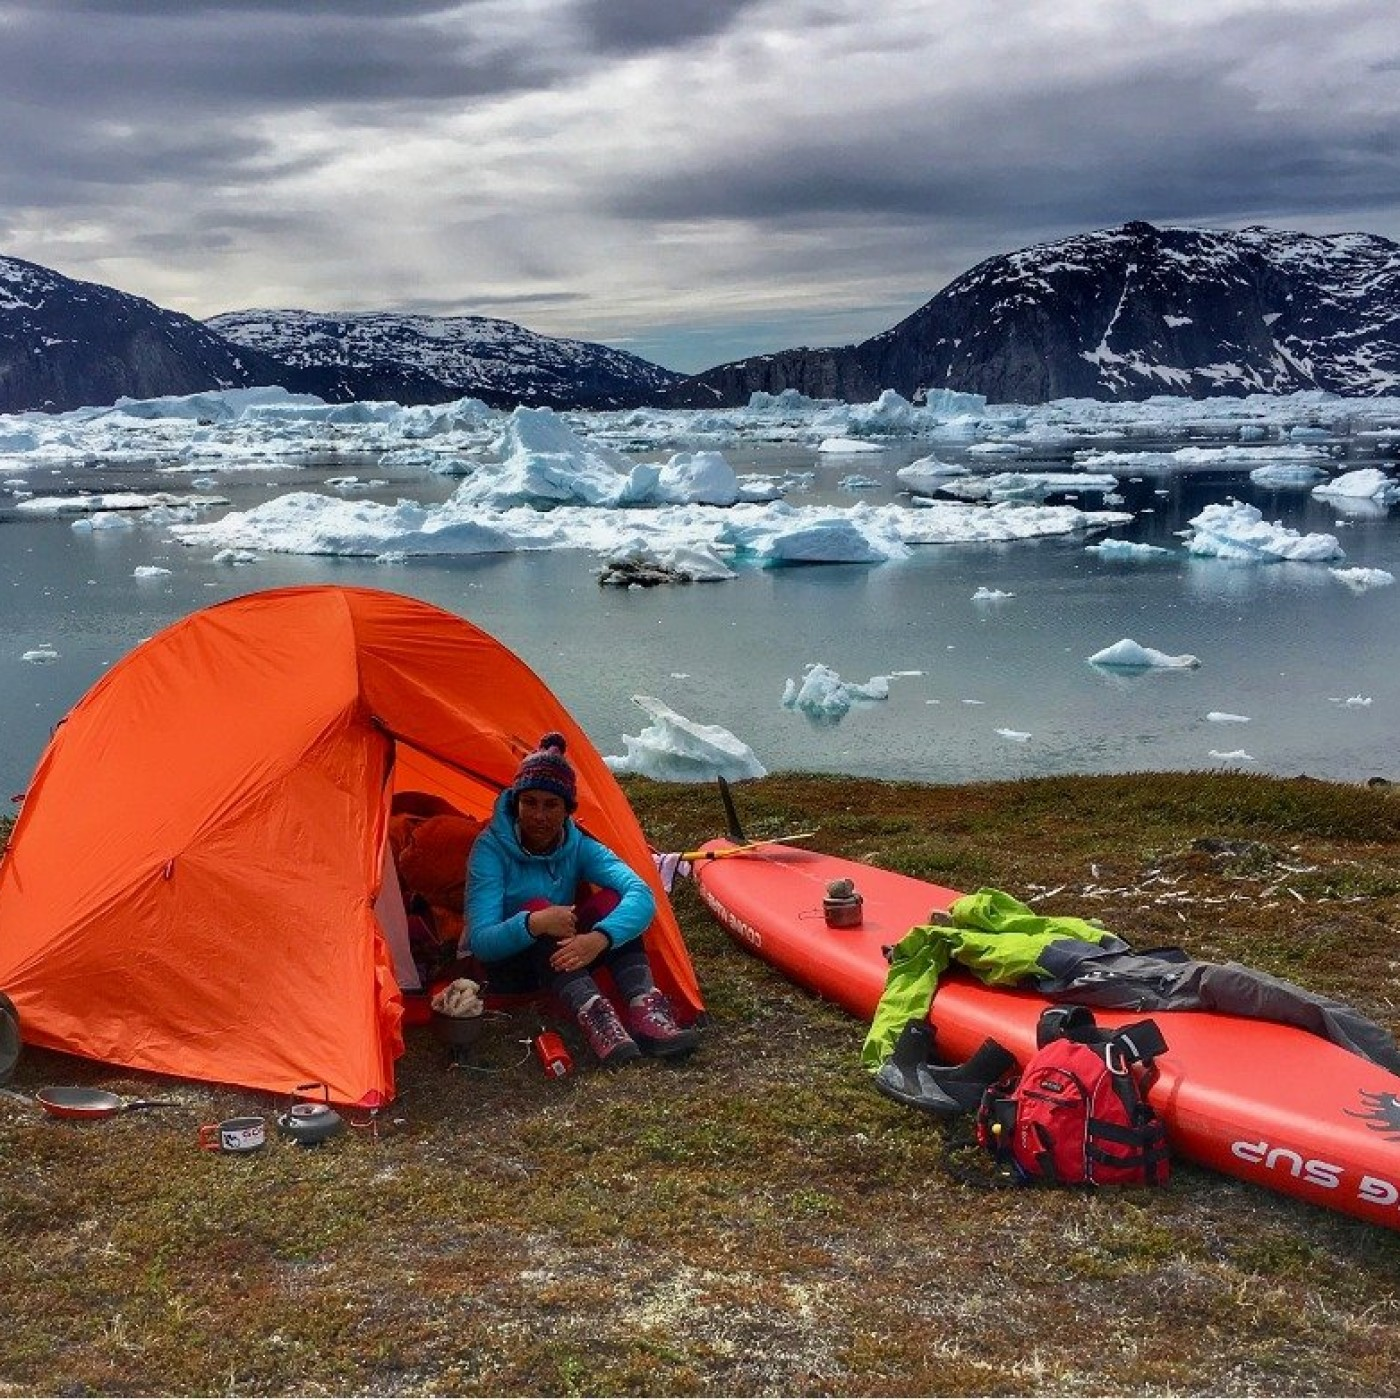 Ingrid Ulrich raconte ses premières aventures - Globe Trotter 07 02 - Déc 2020 - StereoChic Radio